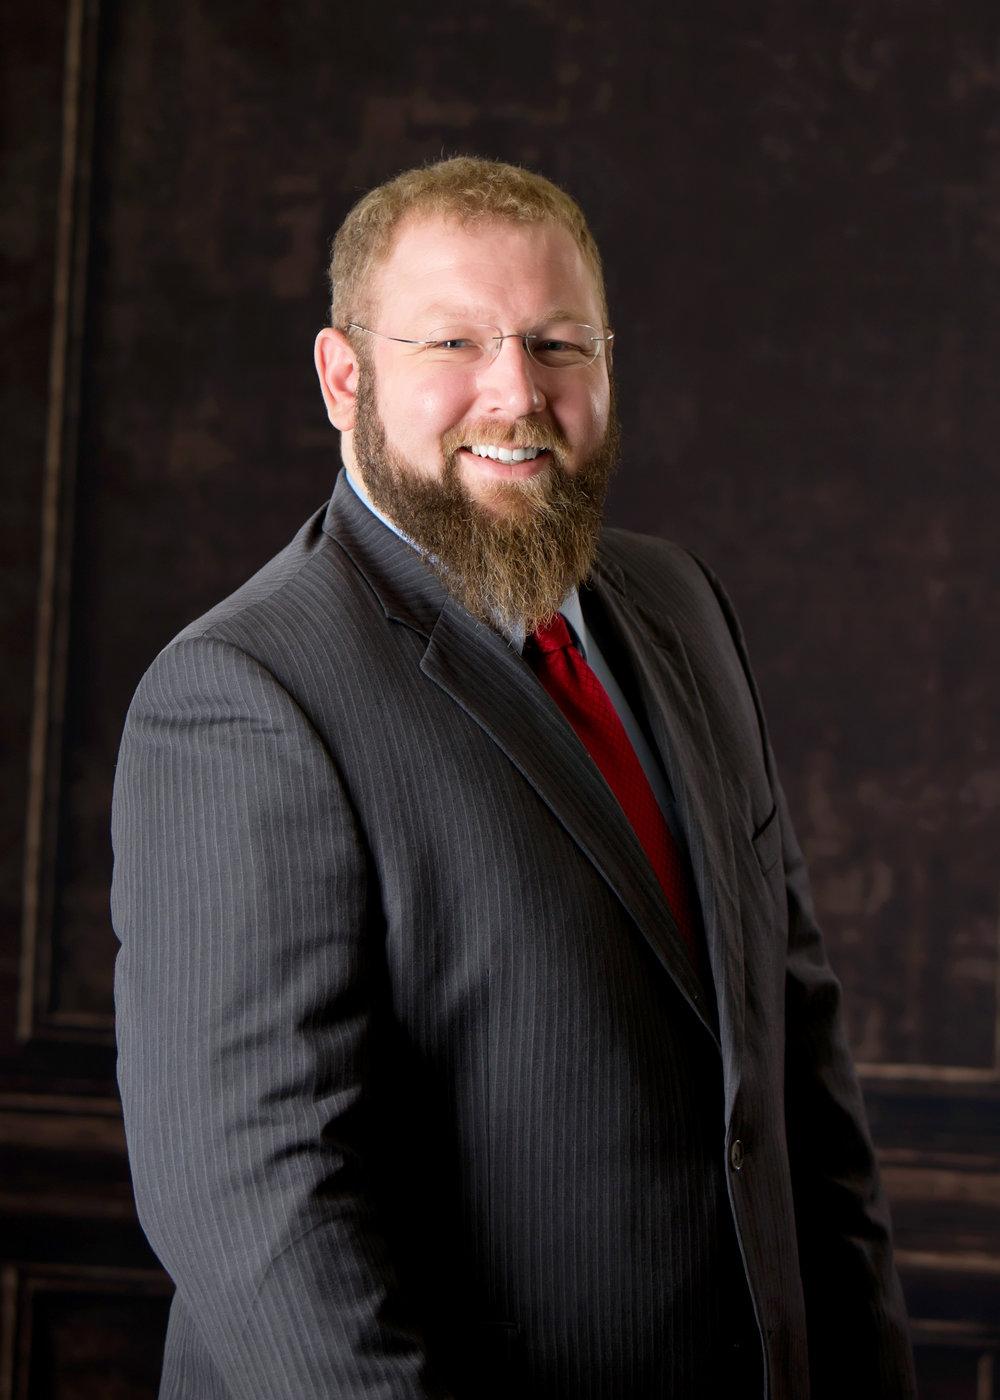 Austin Crowe, Attorney